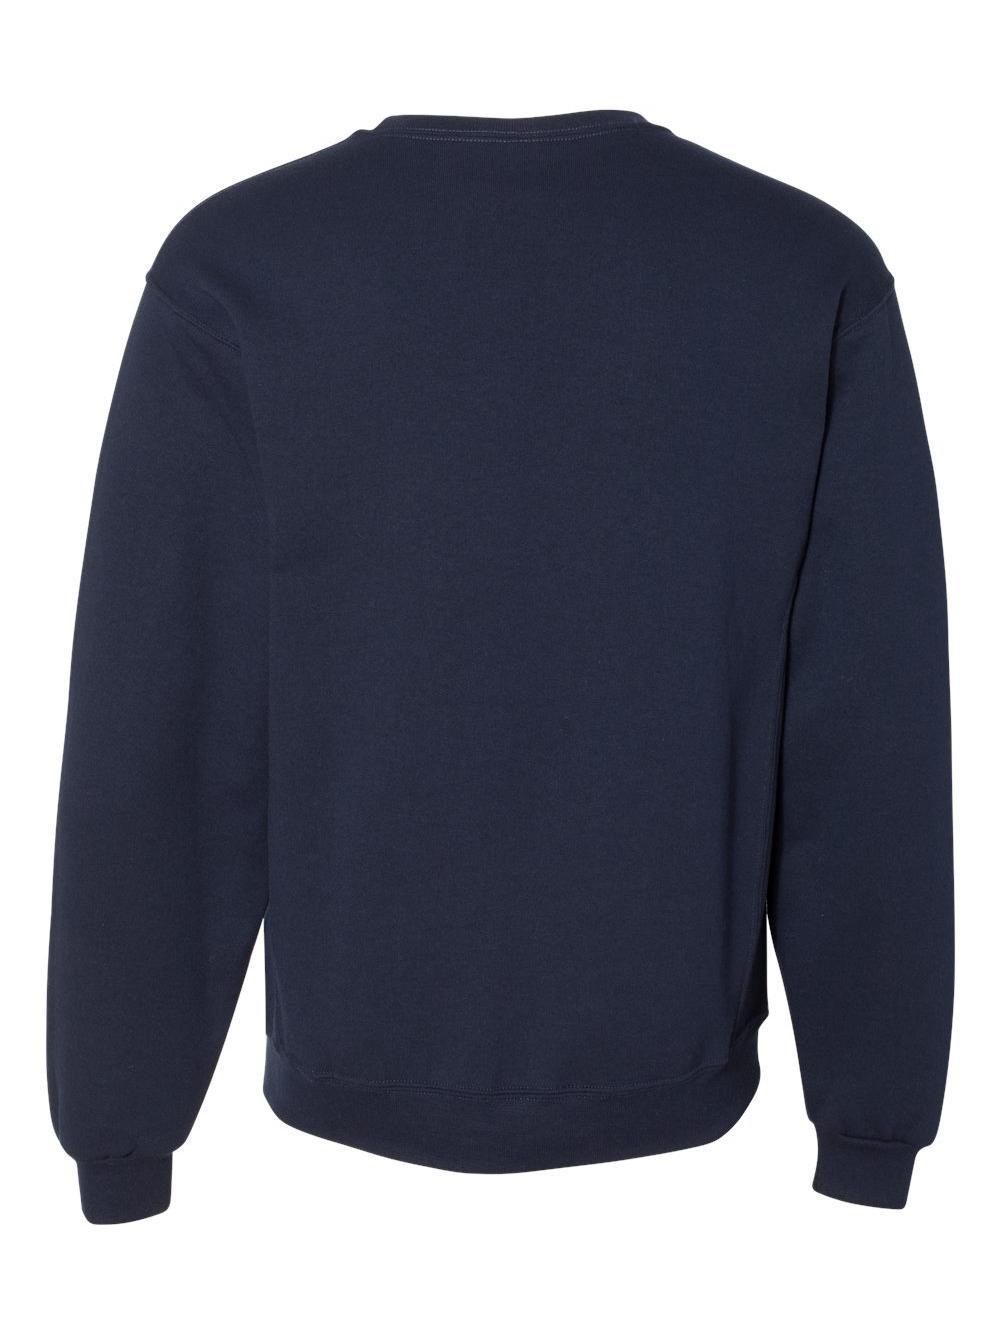 11086db5a Russell Athletic Men's Dri Power Fleece Crew Neck Sweatshirt XXL ...